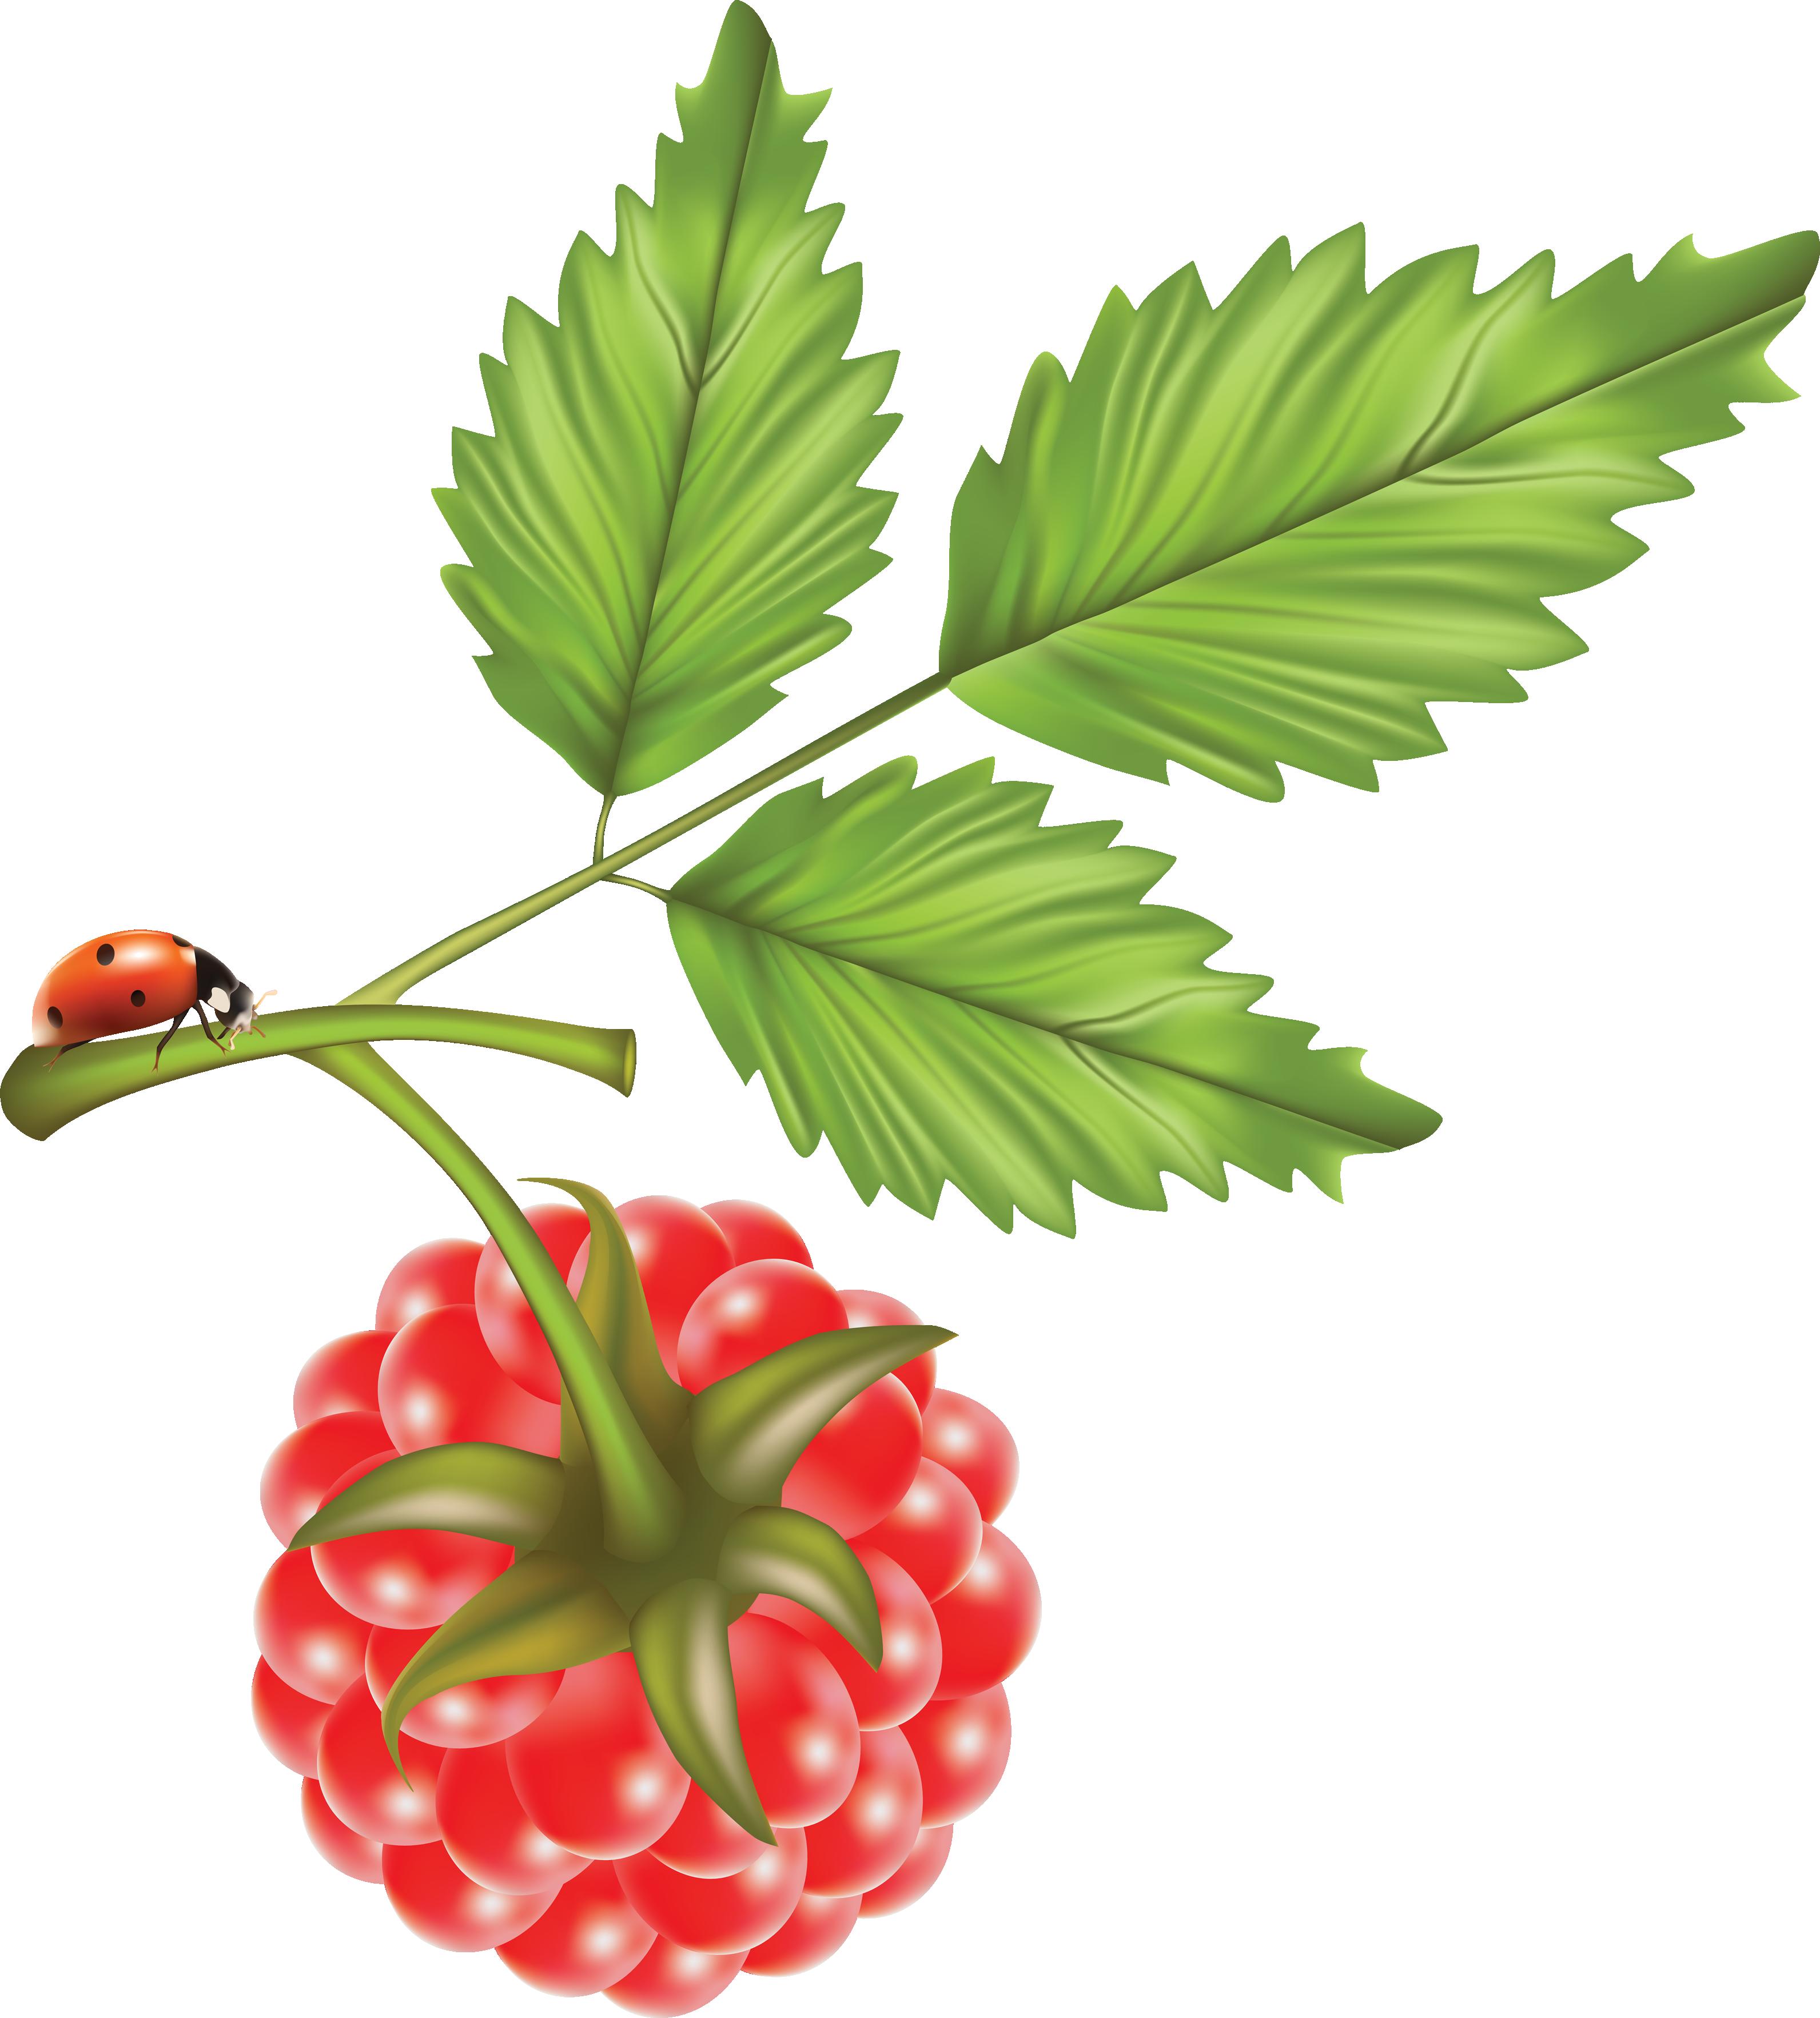 Tree clipart jack fruit. Rraspberry png image pinterest